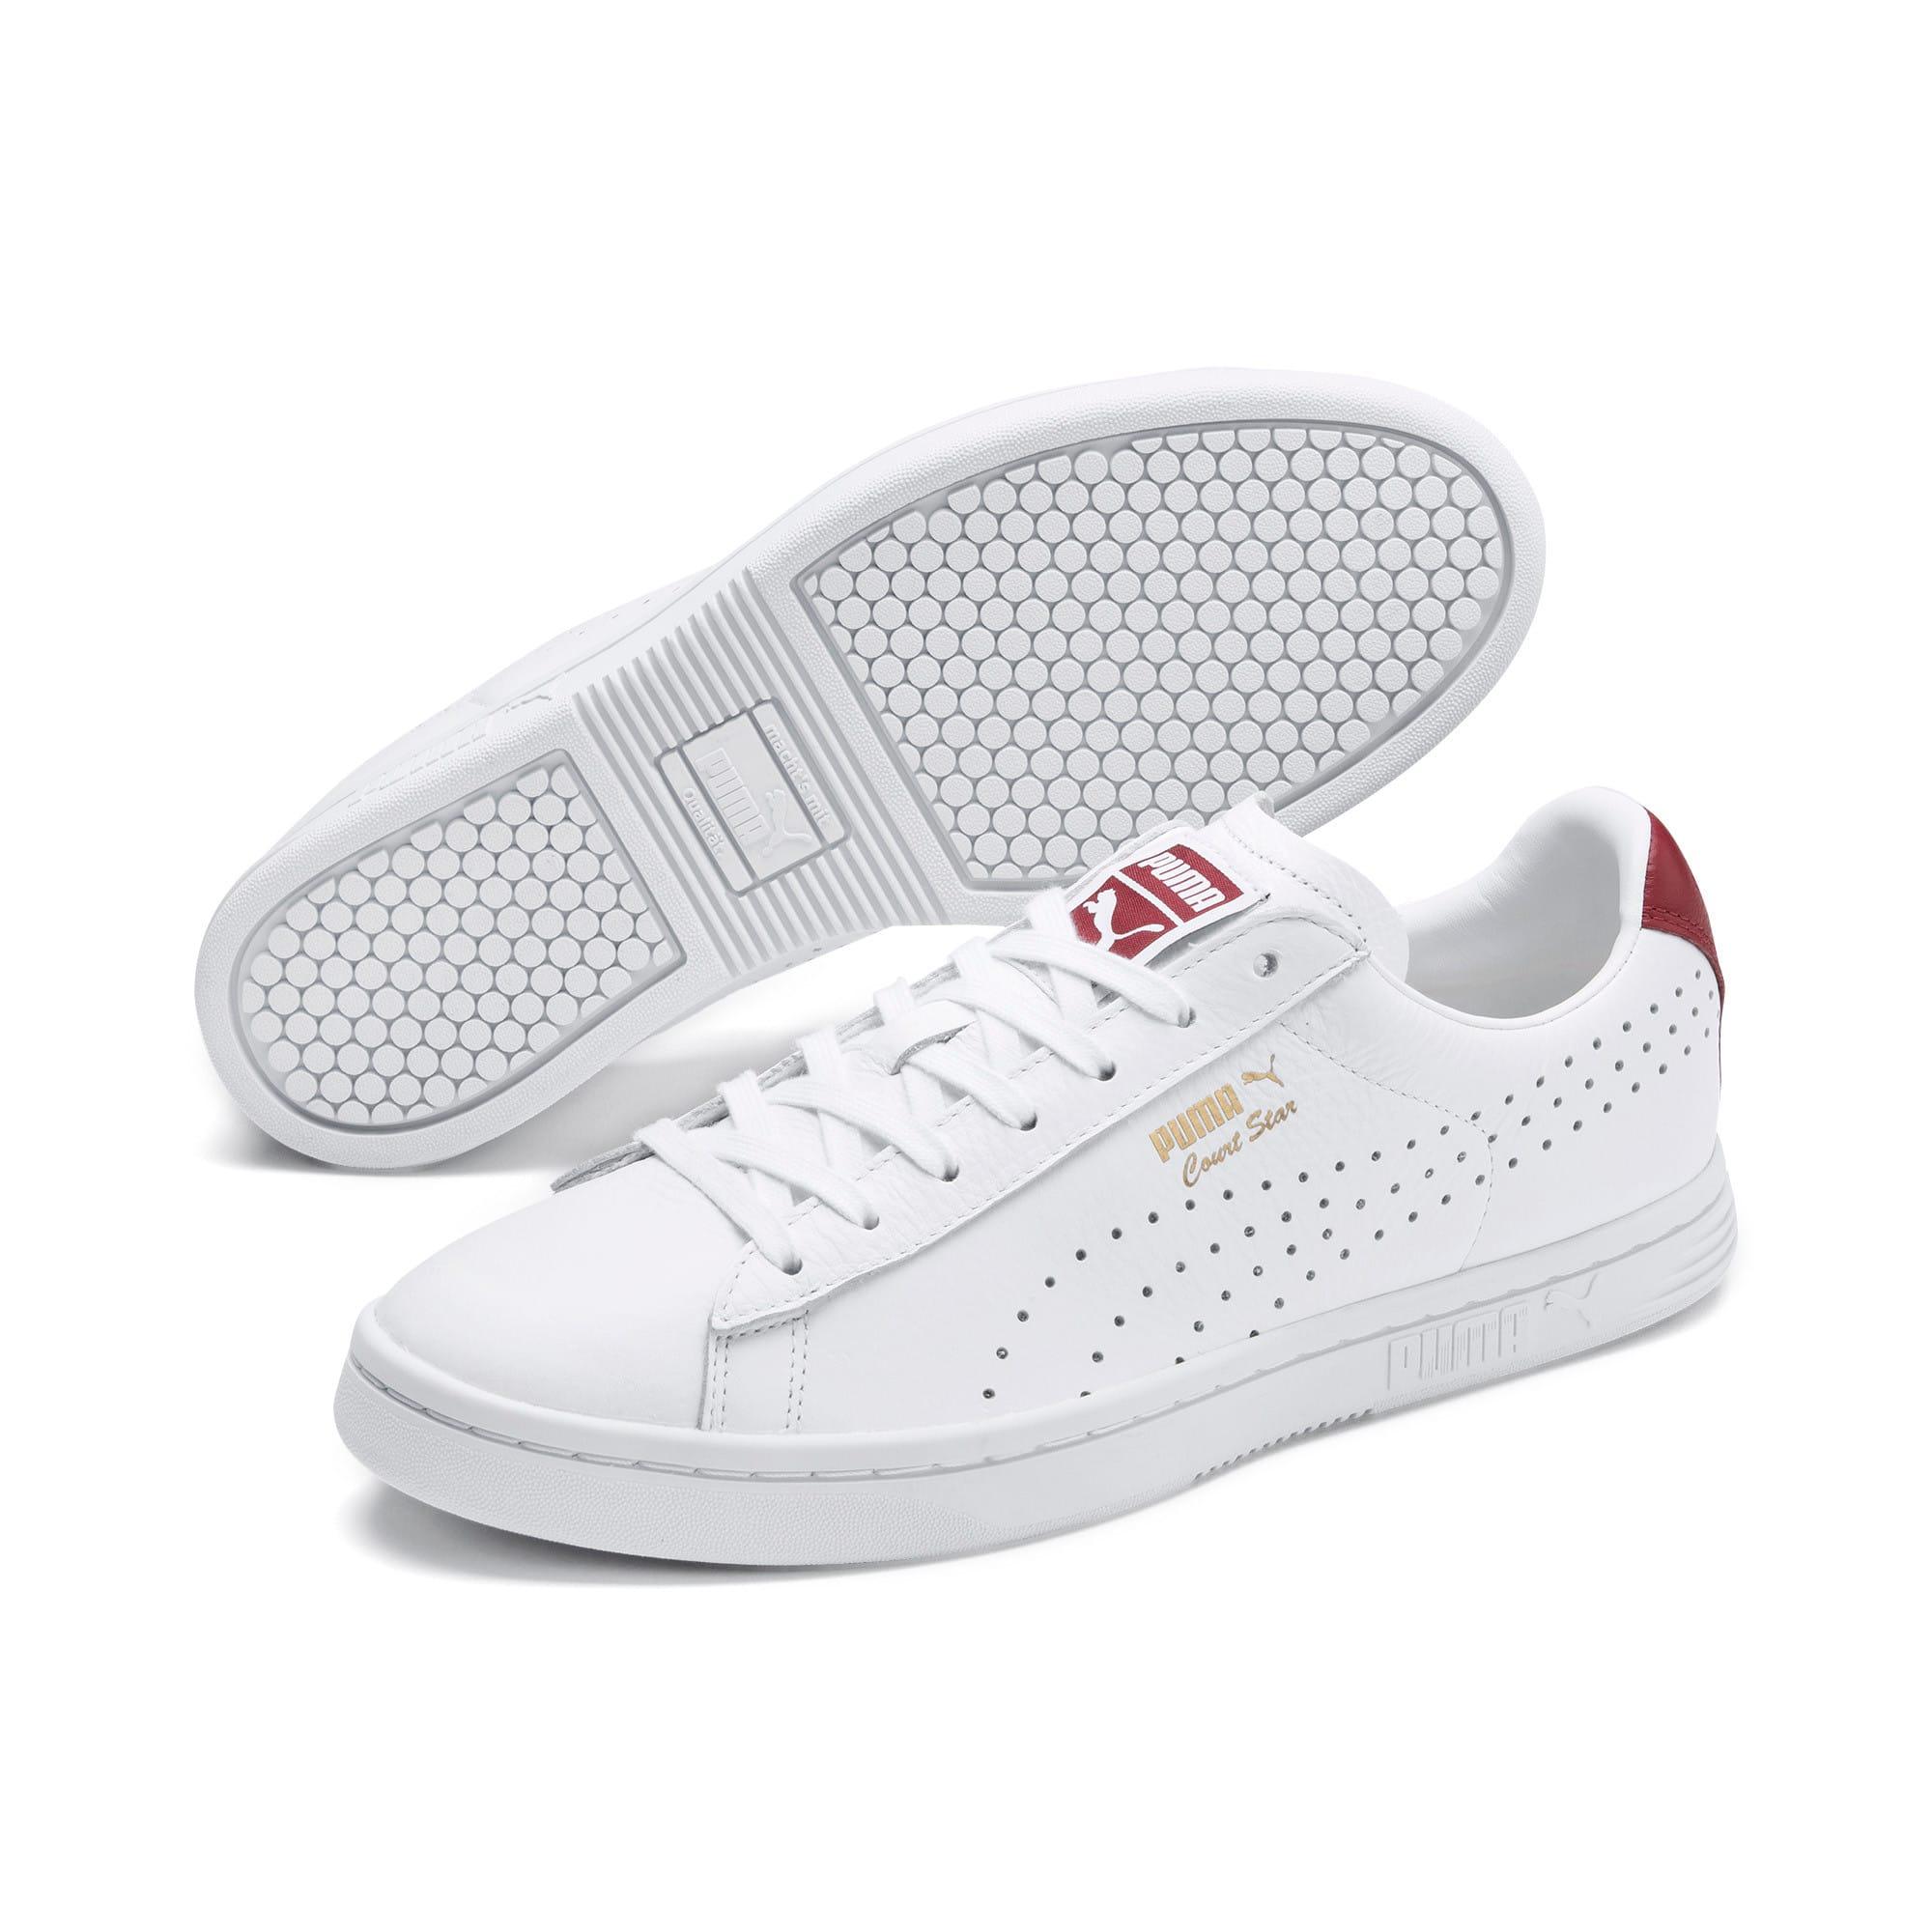 Thumbnail 2 of Court Star Sneakers, Puma White-Rhubarb, medium